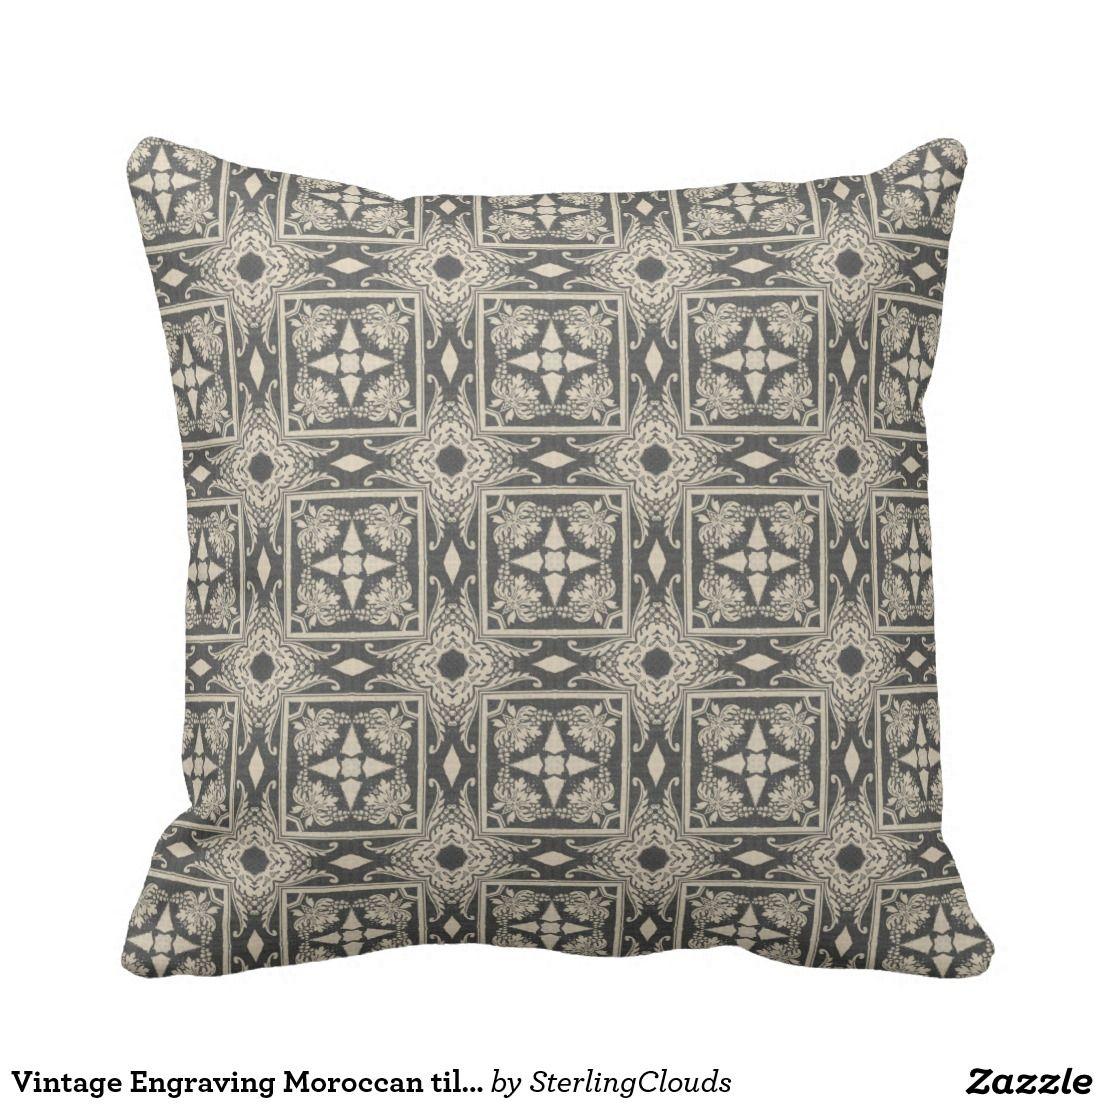 Vintage Engraving Moroccan tiles beige & gray Pillow